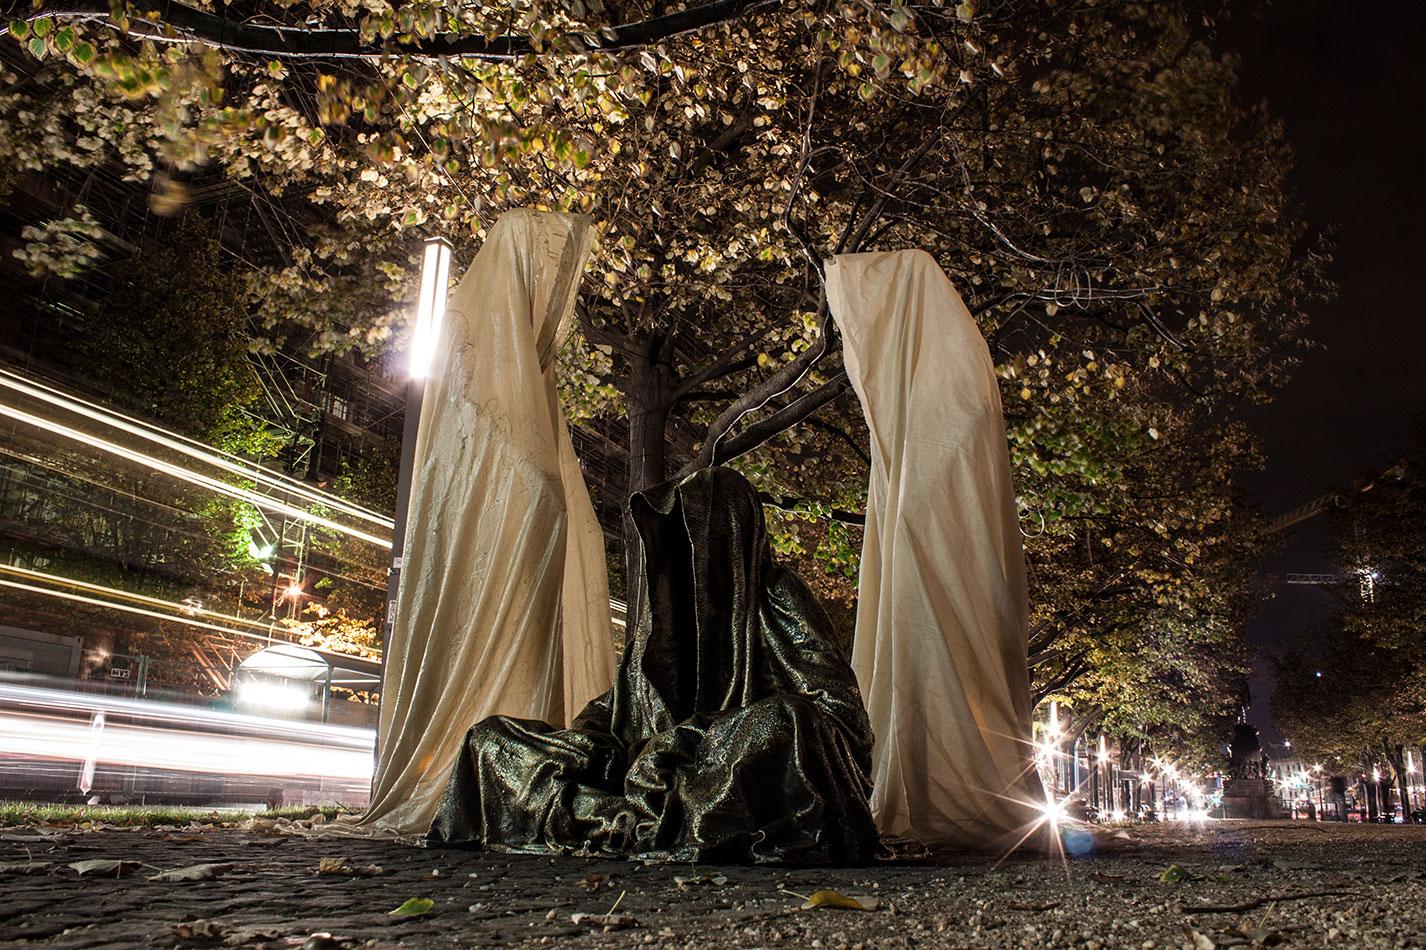 festival-of-lights-berlin-light-art-show-exhibition-lumina-guardians-of-time-manfred-kili-kielnhofer-contemporary-arts-design-sculpture-3477